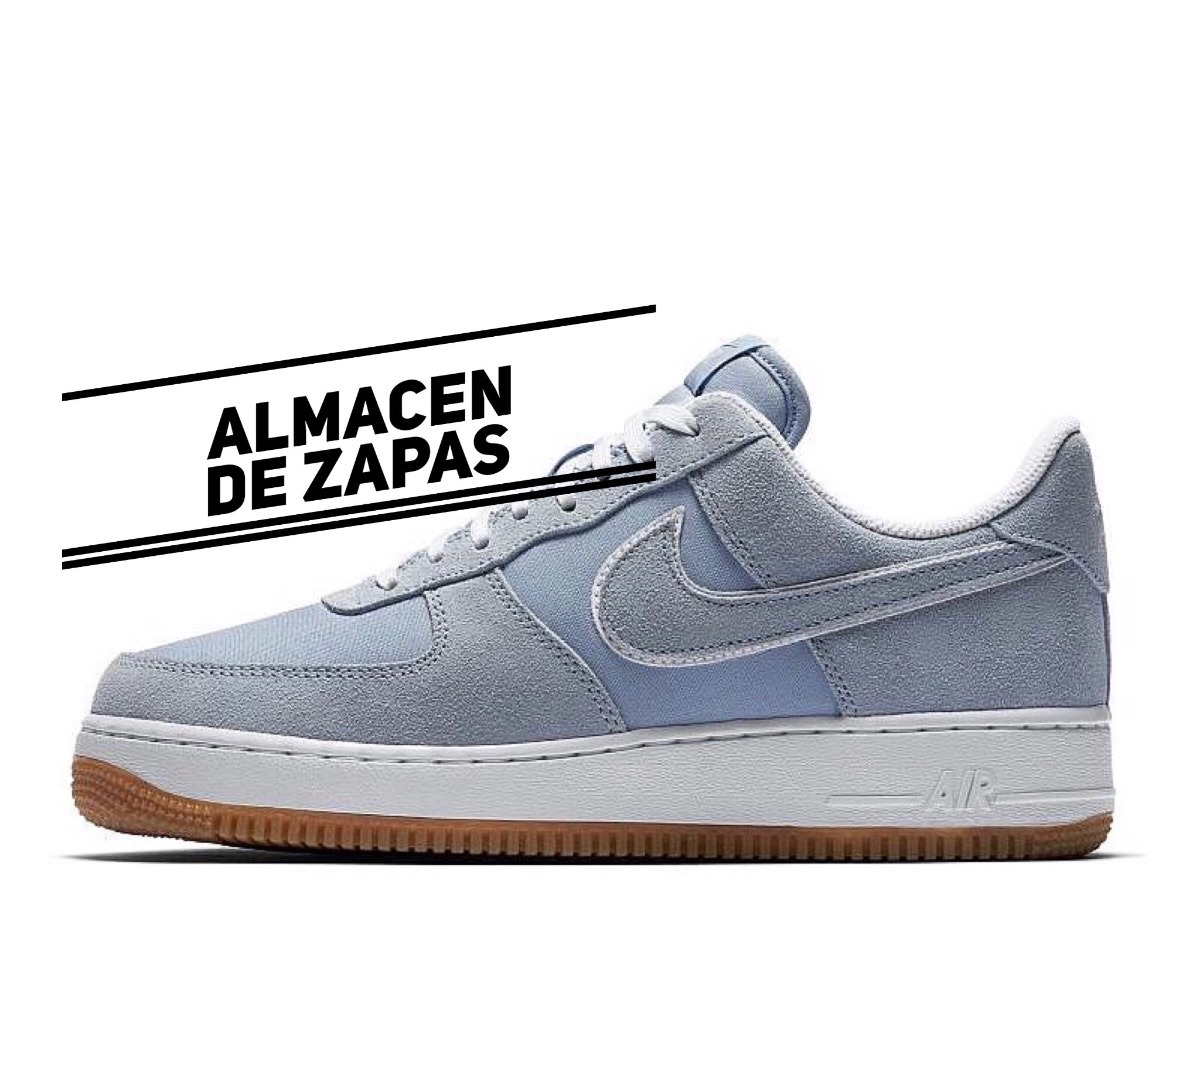 eaf6ad2626 Nike Air Force 1 07 Low Zapatillas New 2017(modelo A Pedido ...